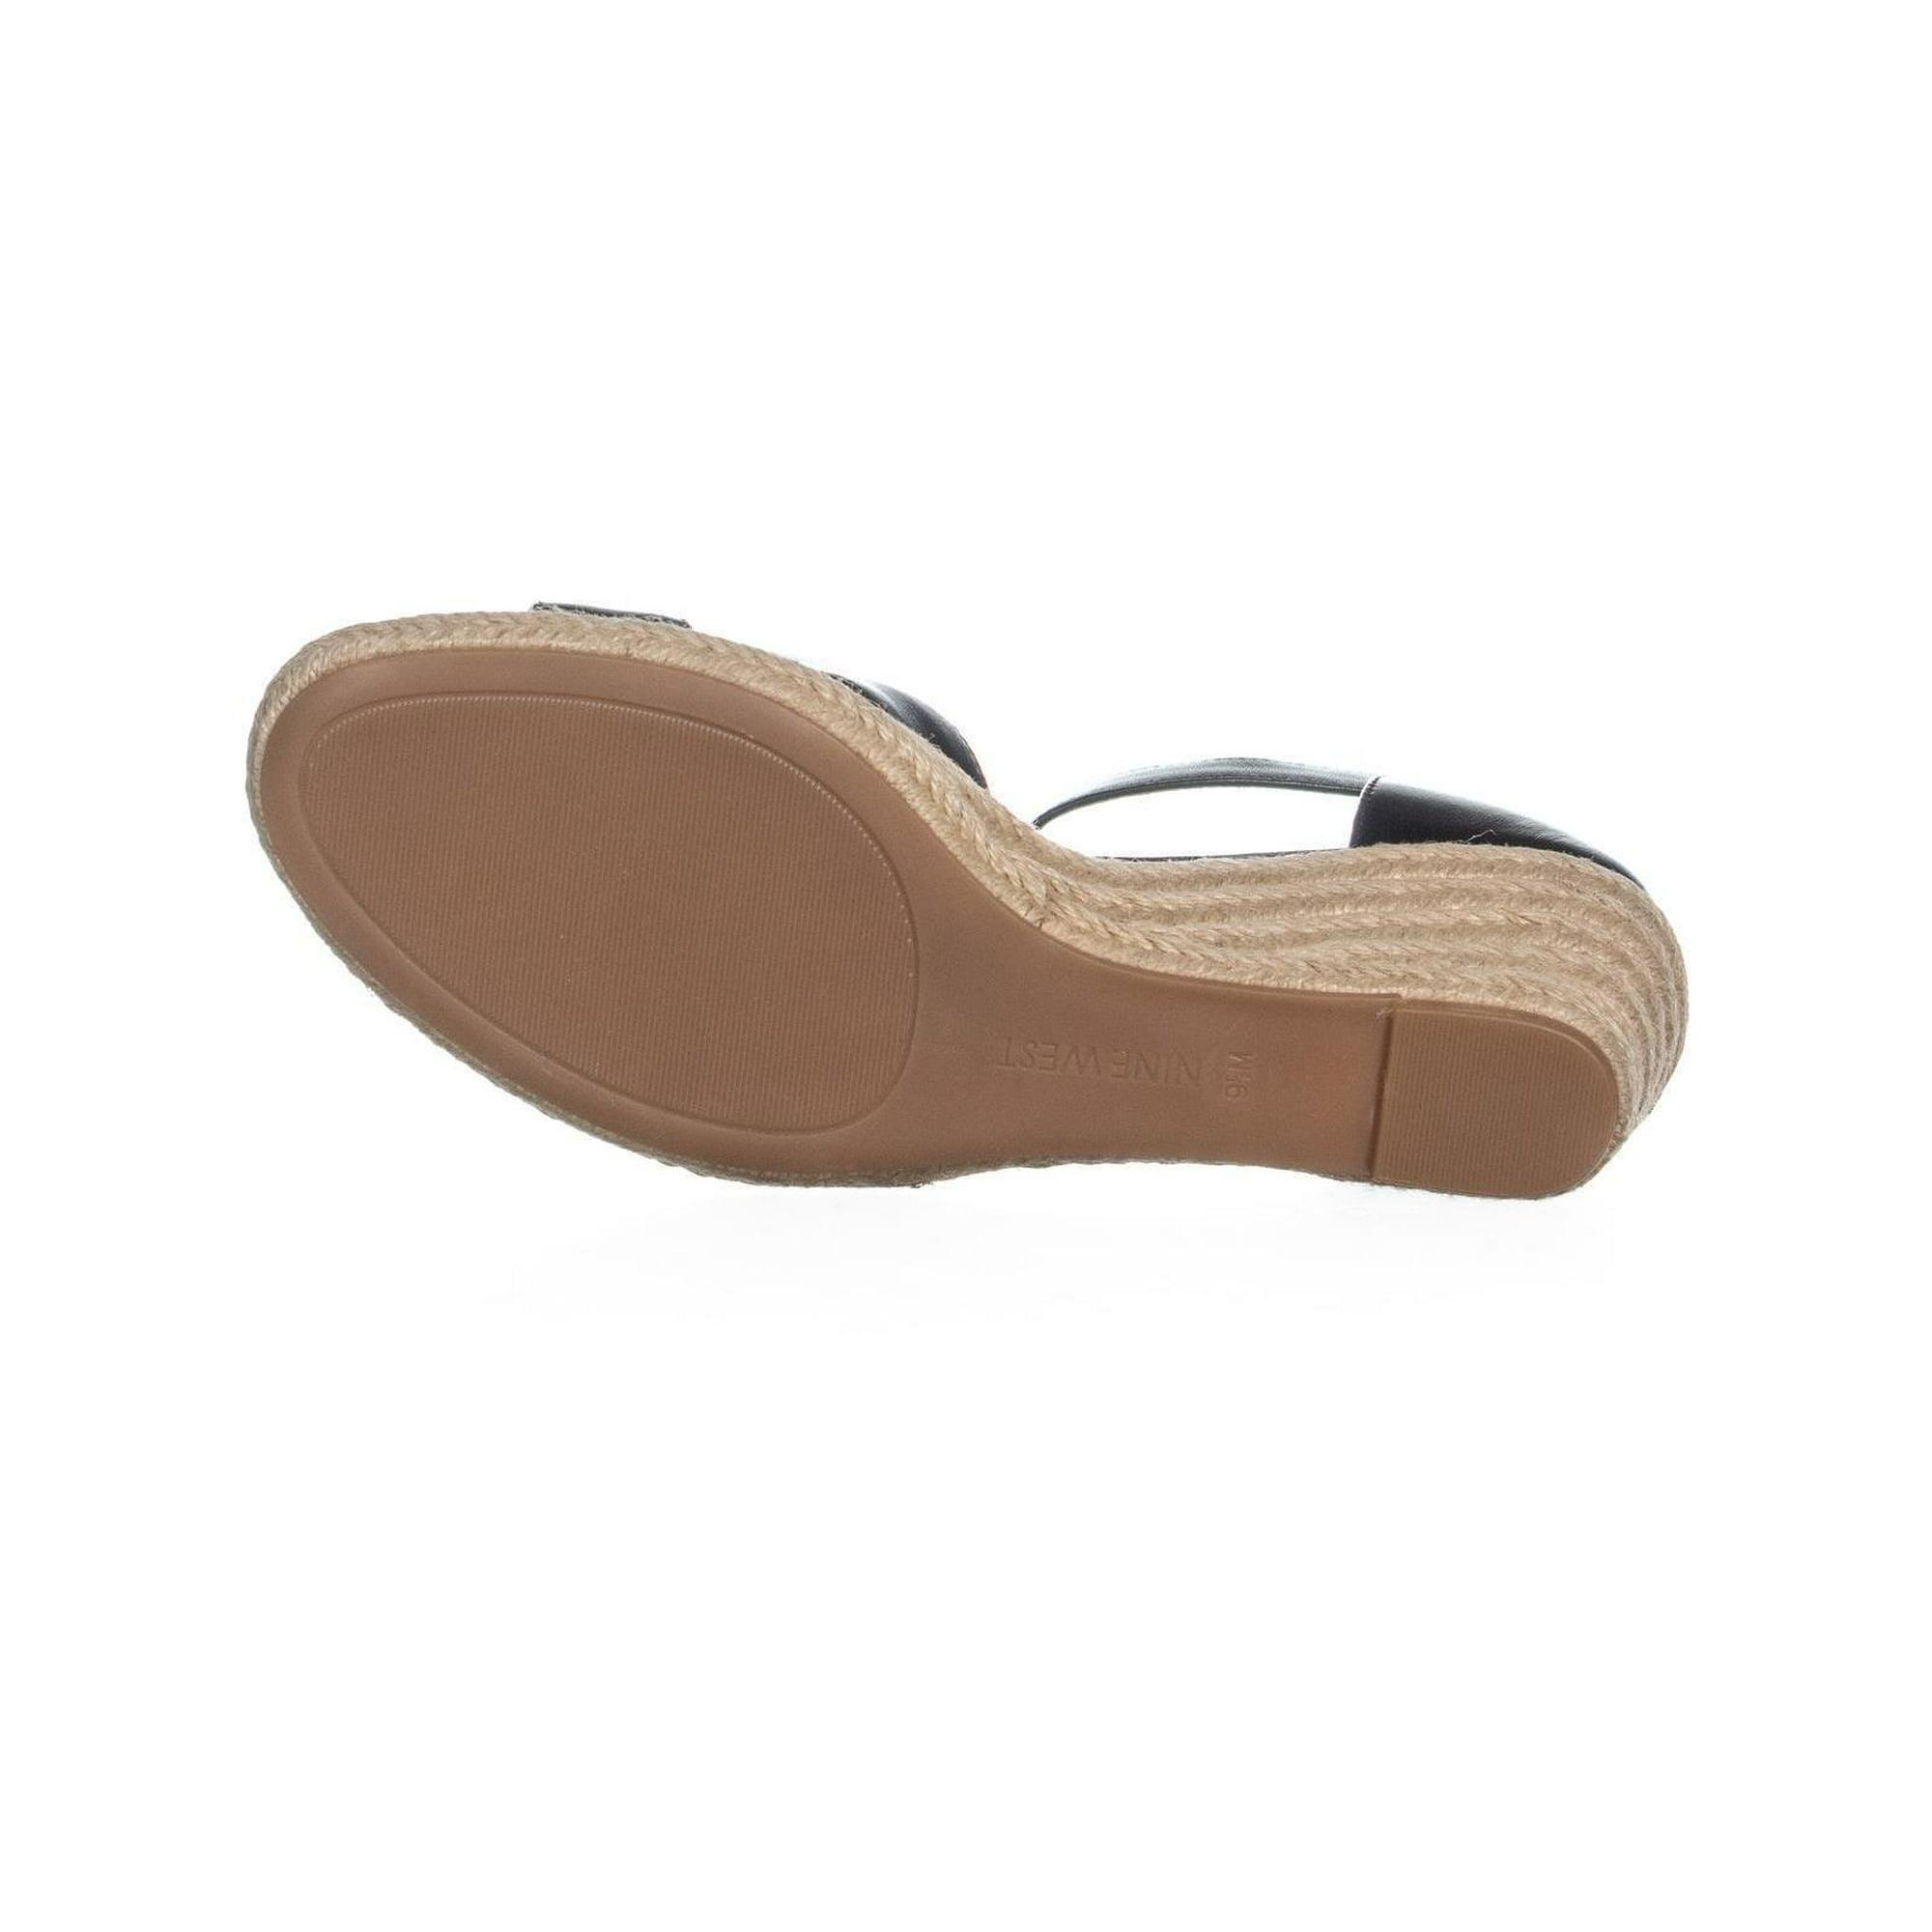 e4b29c30245 Nine West Jeranna Wedge Heel Espadrilles Sandals